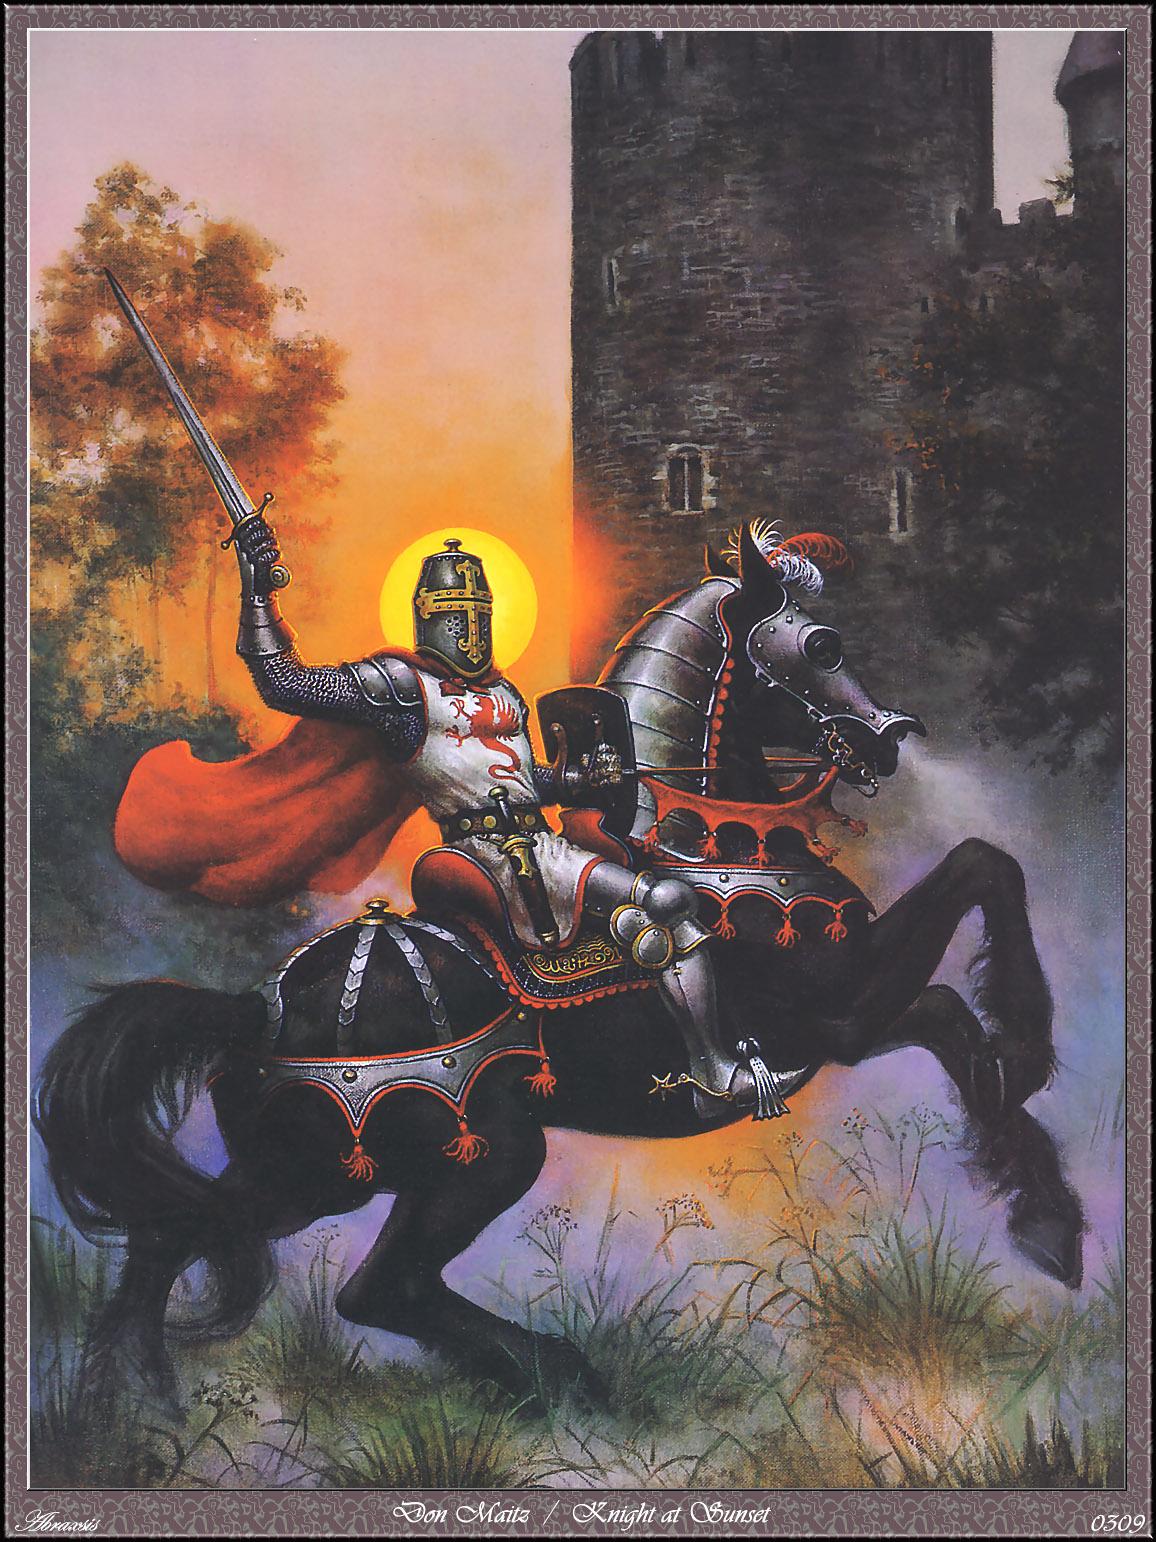 Don Maitz - Knight at Sunset by chavi-dragon